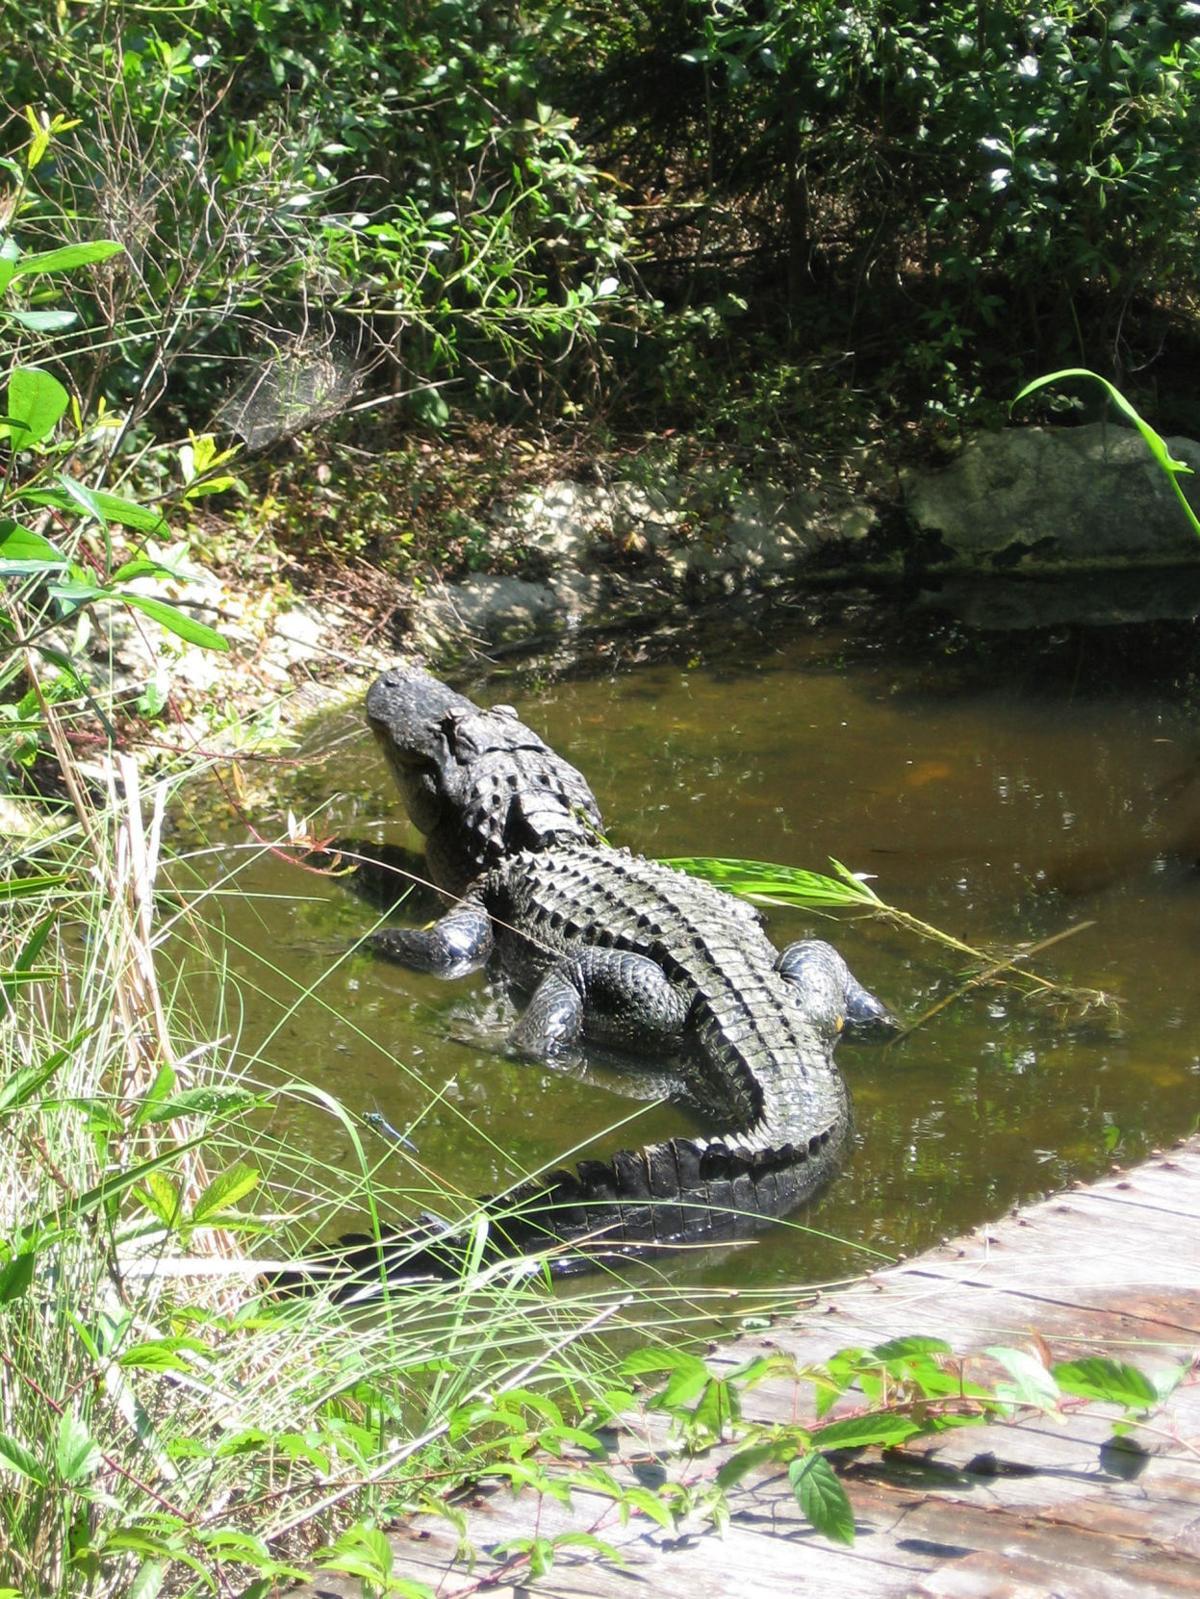 South Carolina parks to rebuild destroyed nature center